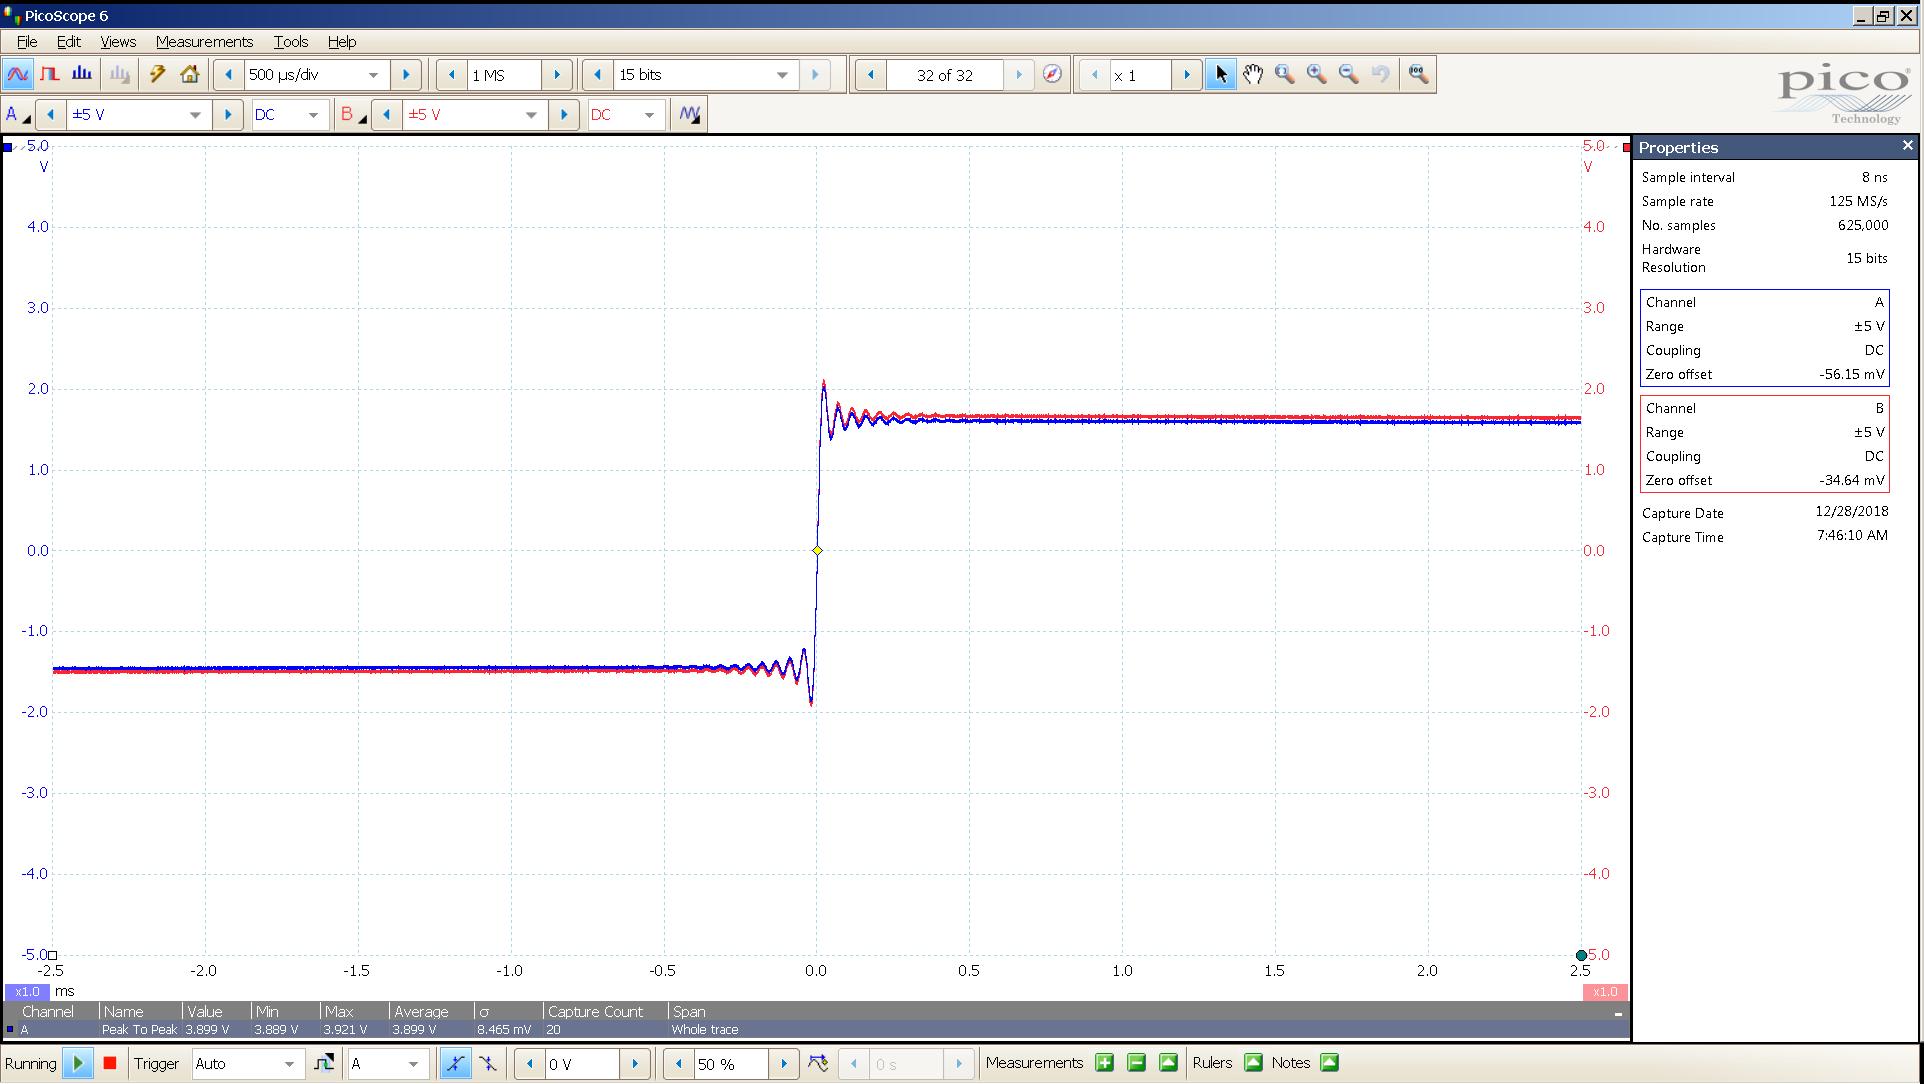 20181227-21 convert2 Bal 20 Hz sqr 0 dBFS 4 Vpp 500uS div - AES 44K.PNG